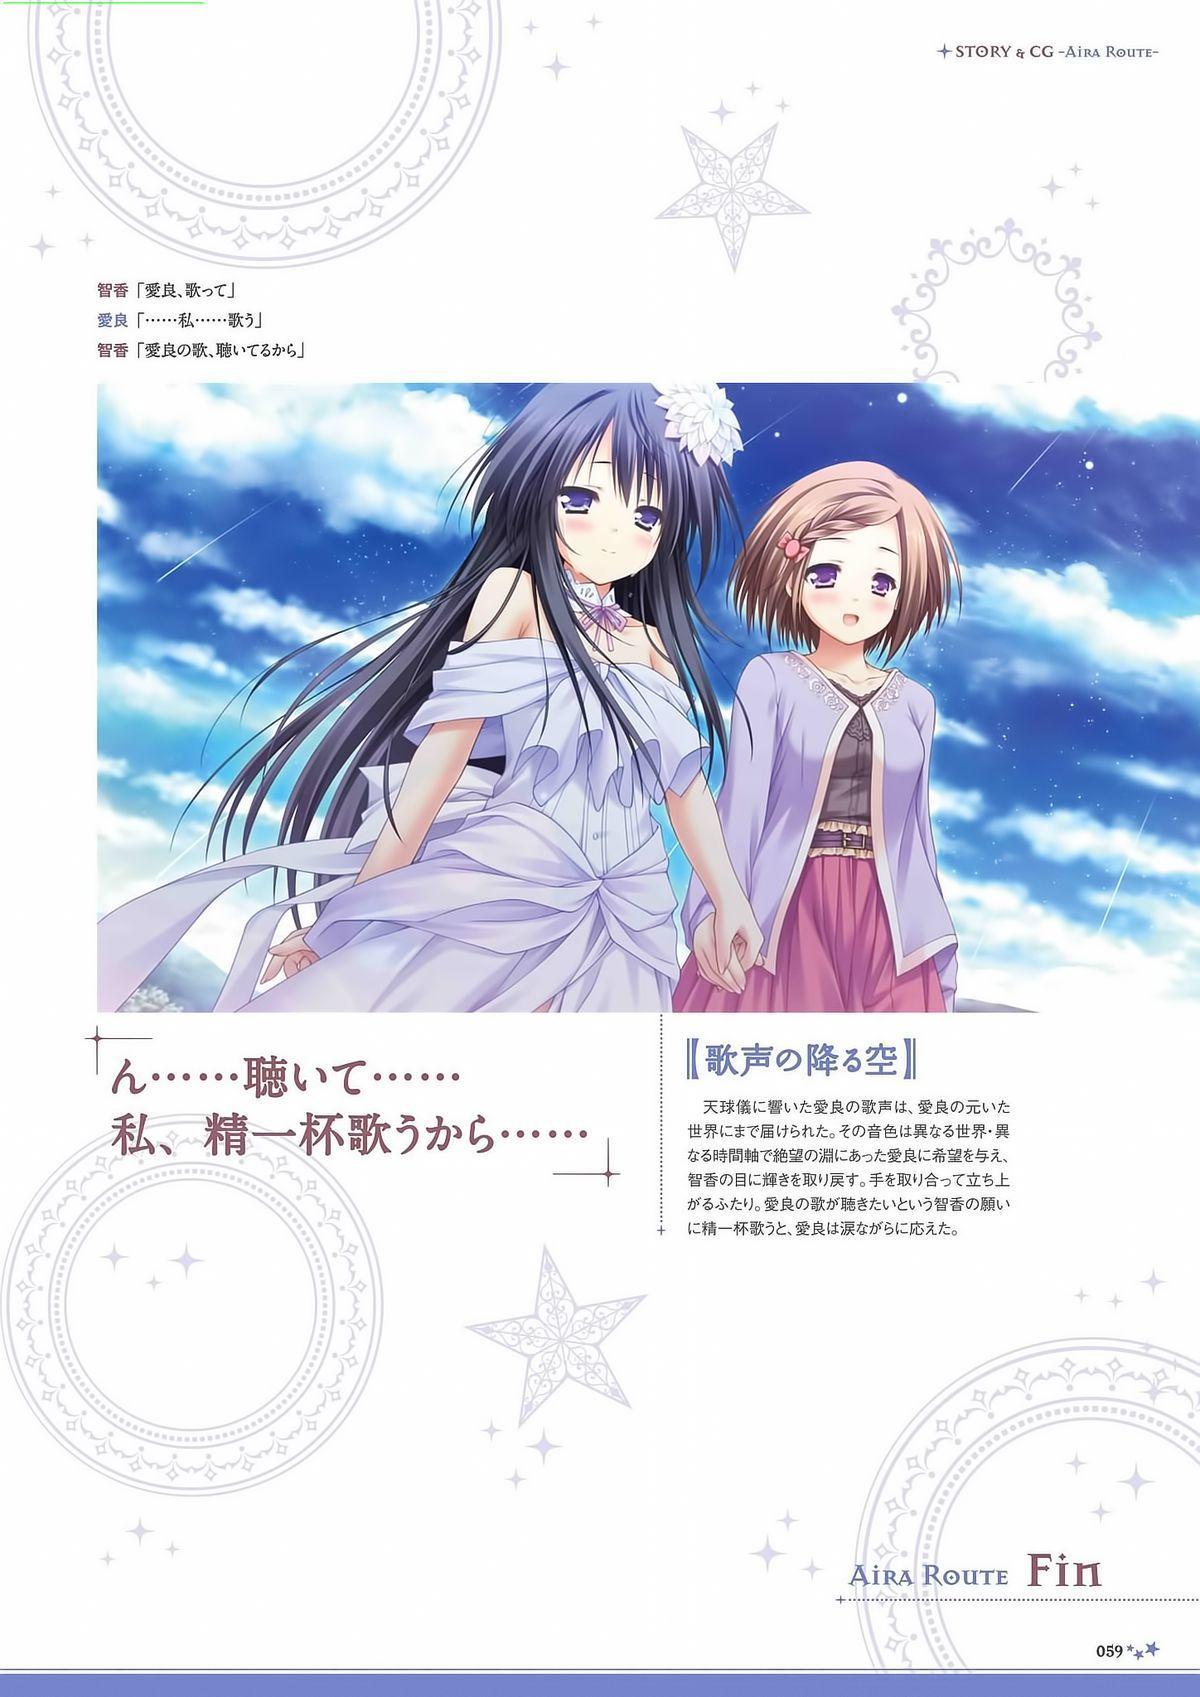 Sekai to Sekai no Mannaka de Visual Fanbook 60